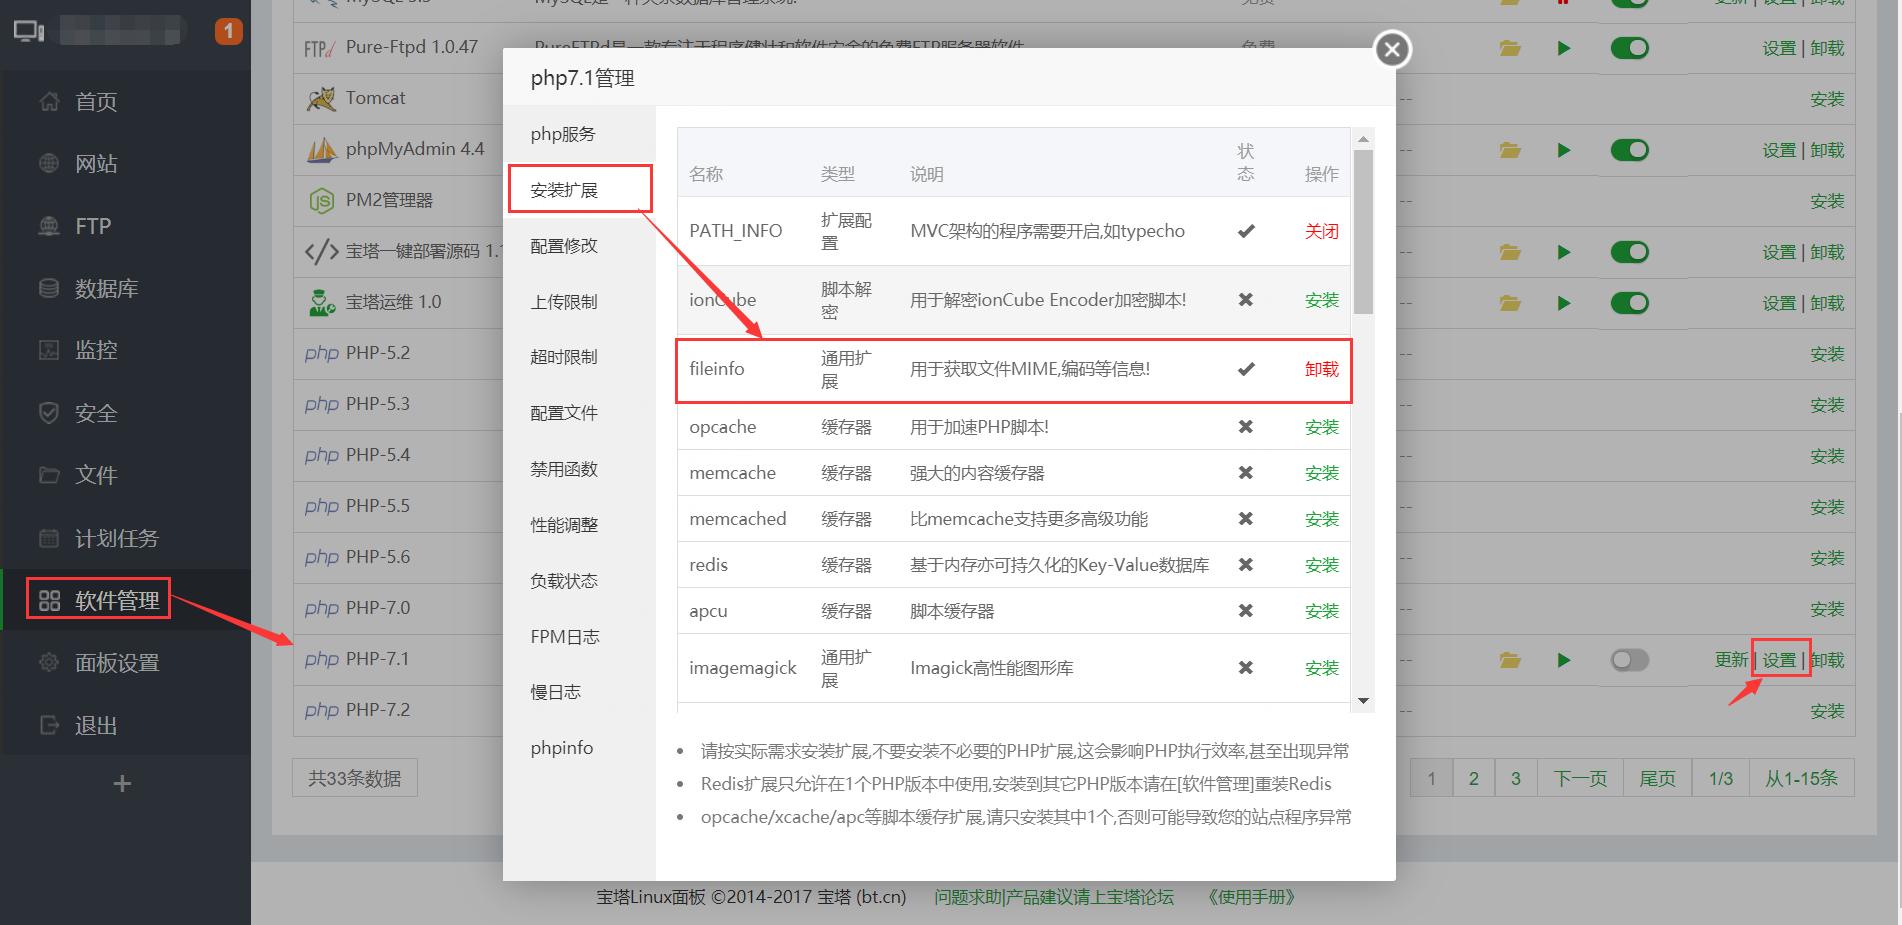 CentOS 7 安装宝塔 Linux 面板(bt.cn)、Flarum